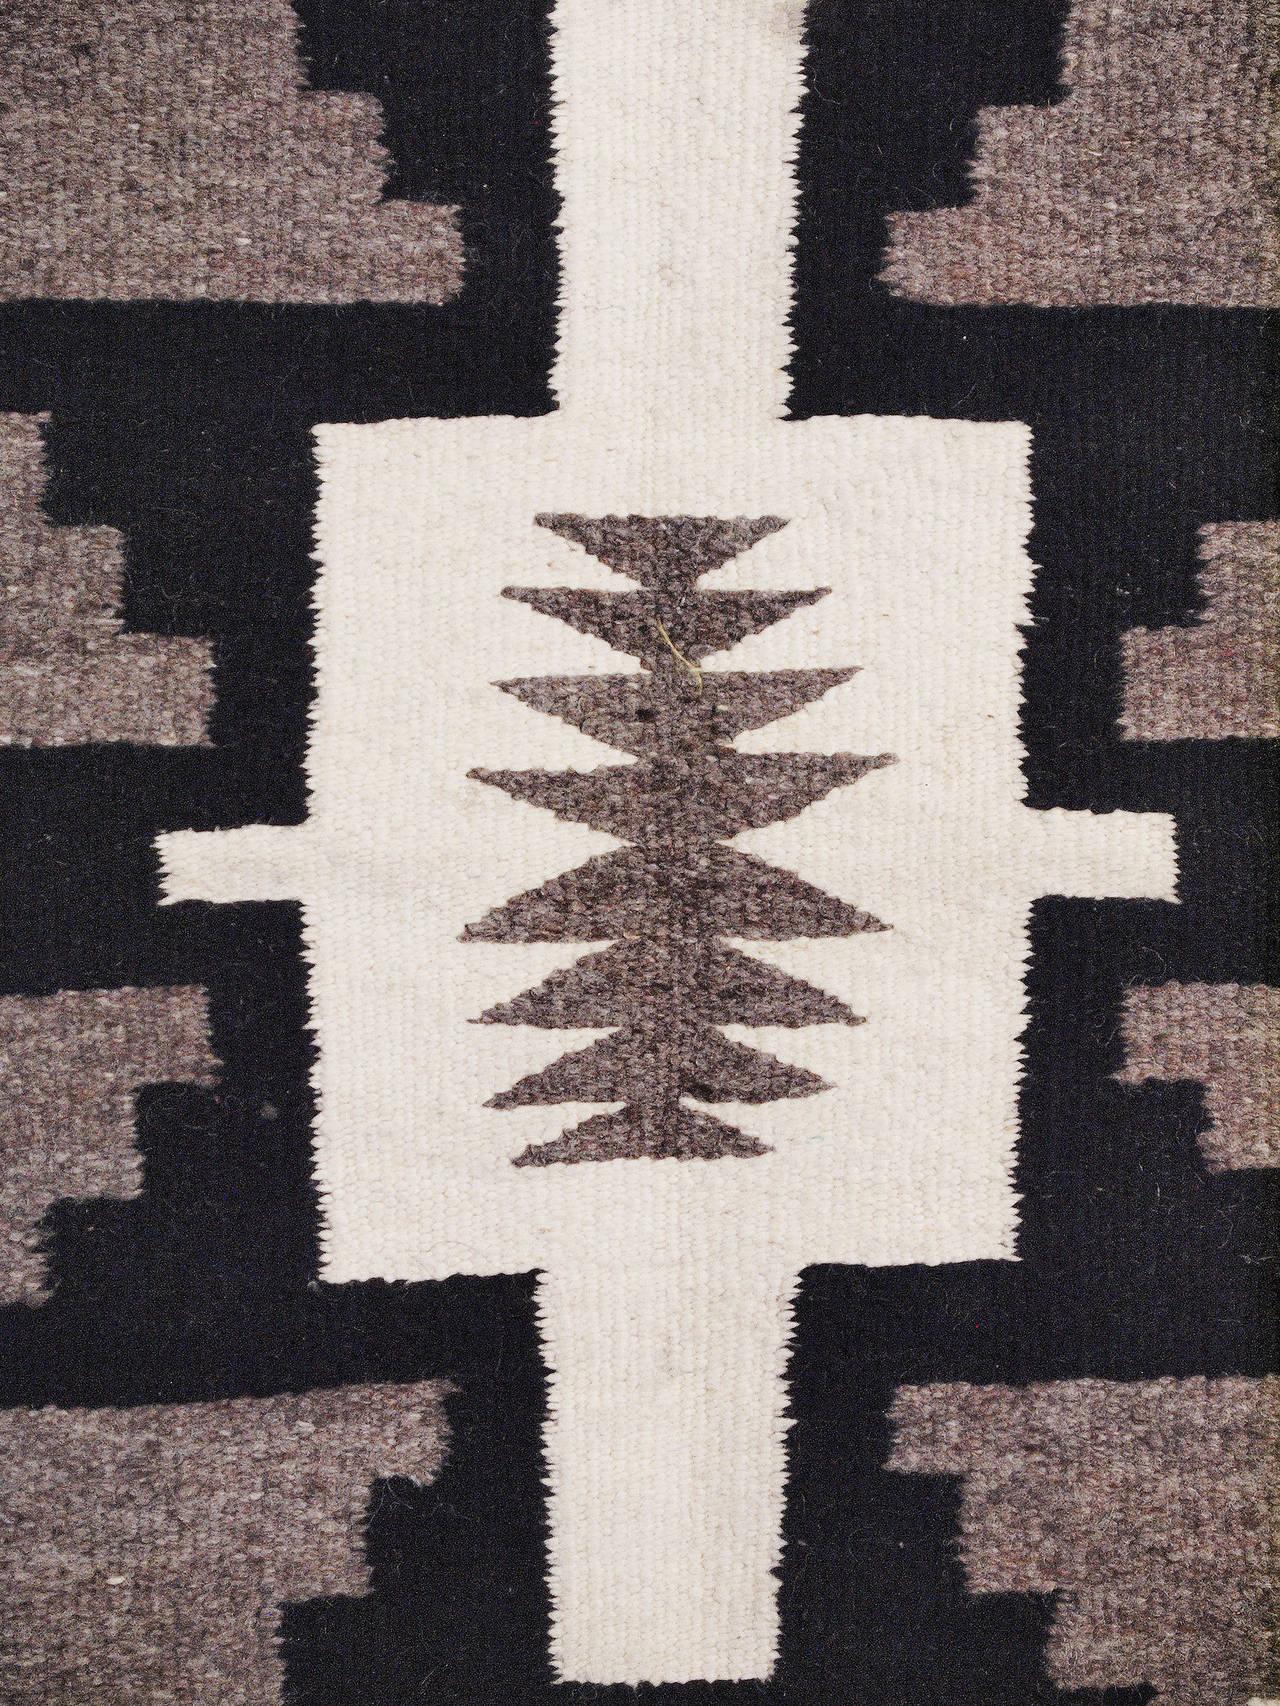 Vintage Navajo Rug Trading Post Regional Style Mid 20th